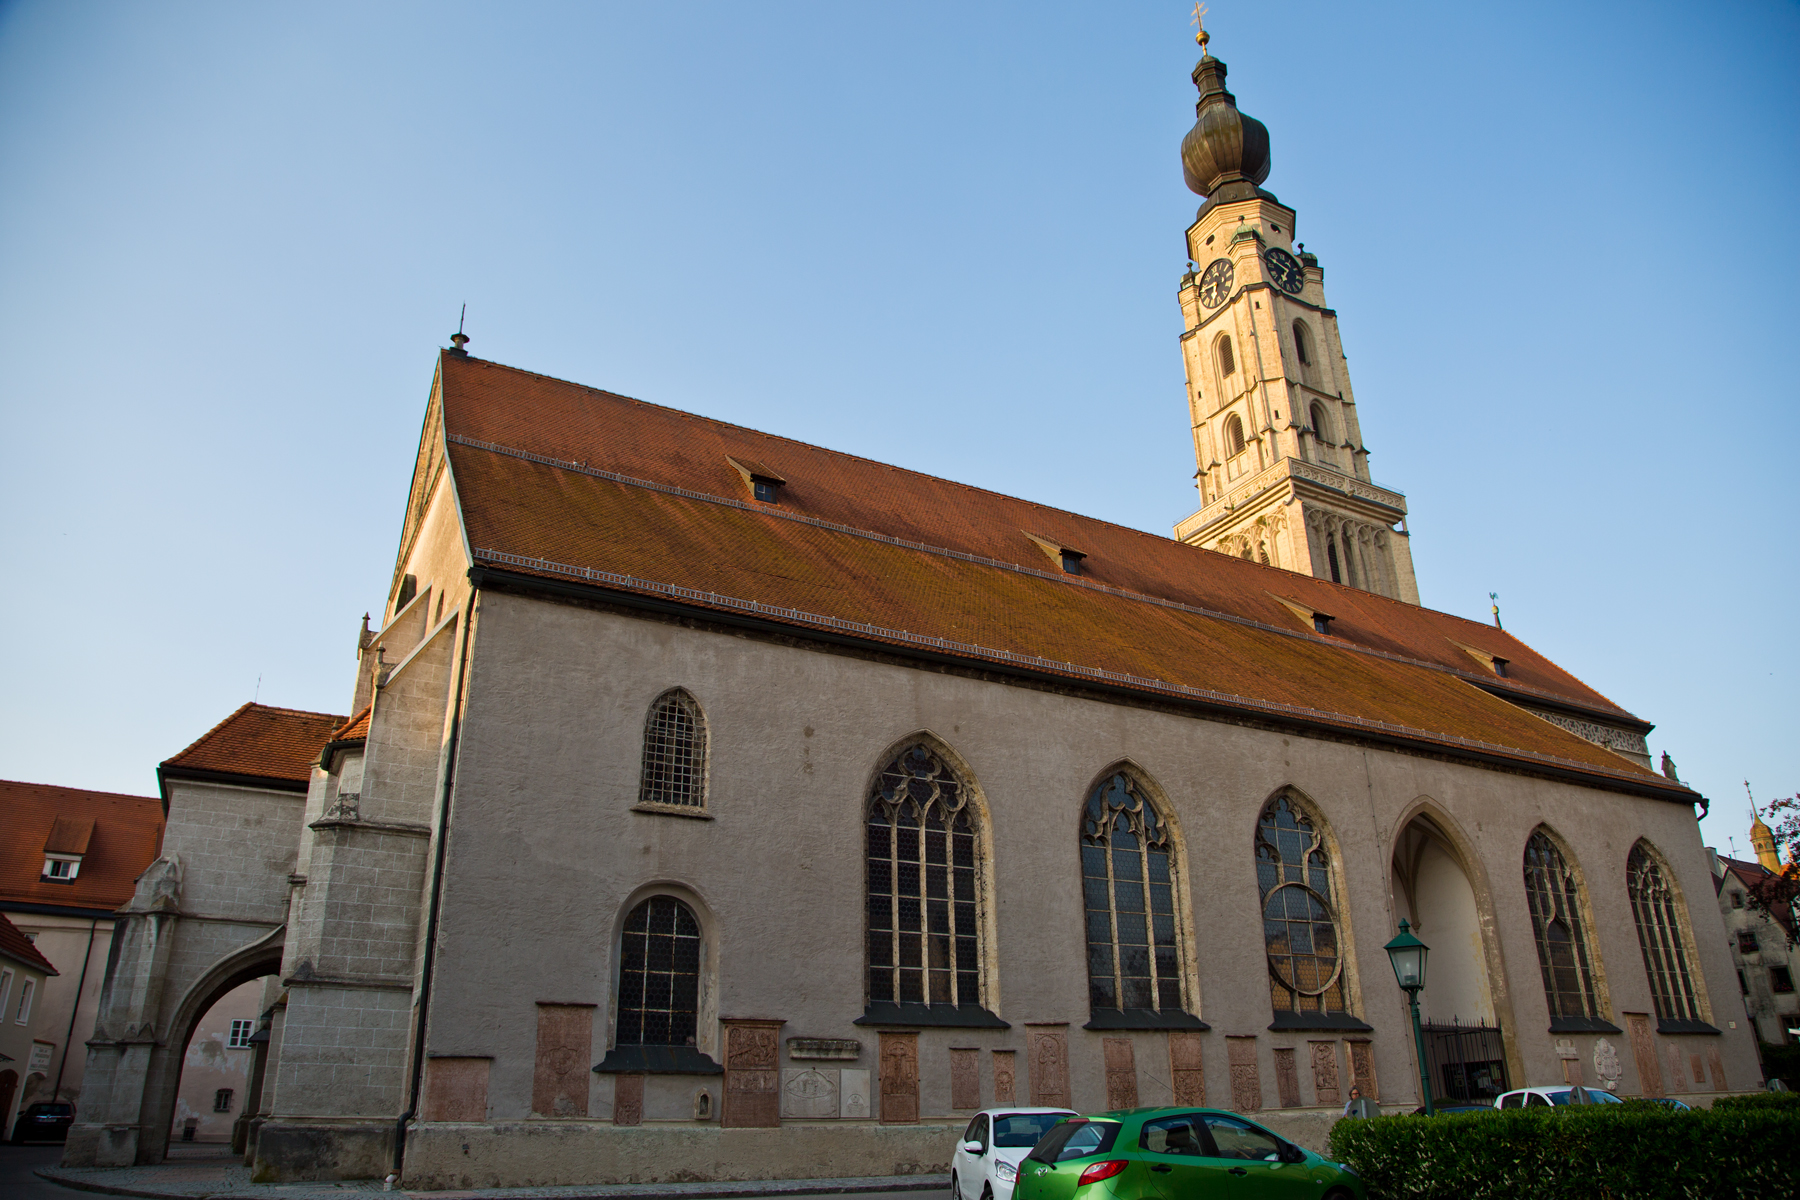 Kirche St. Stephan